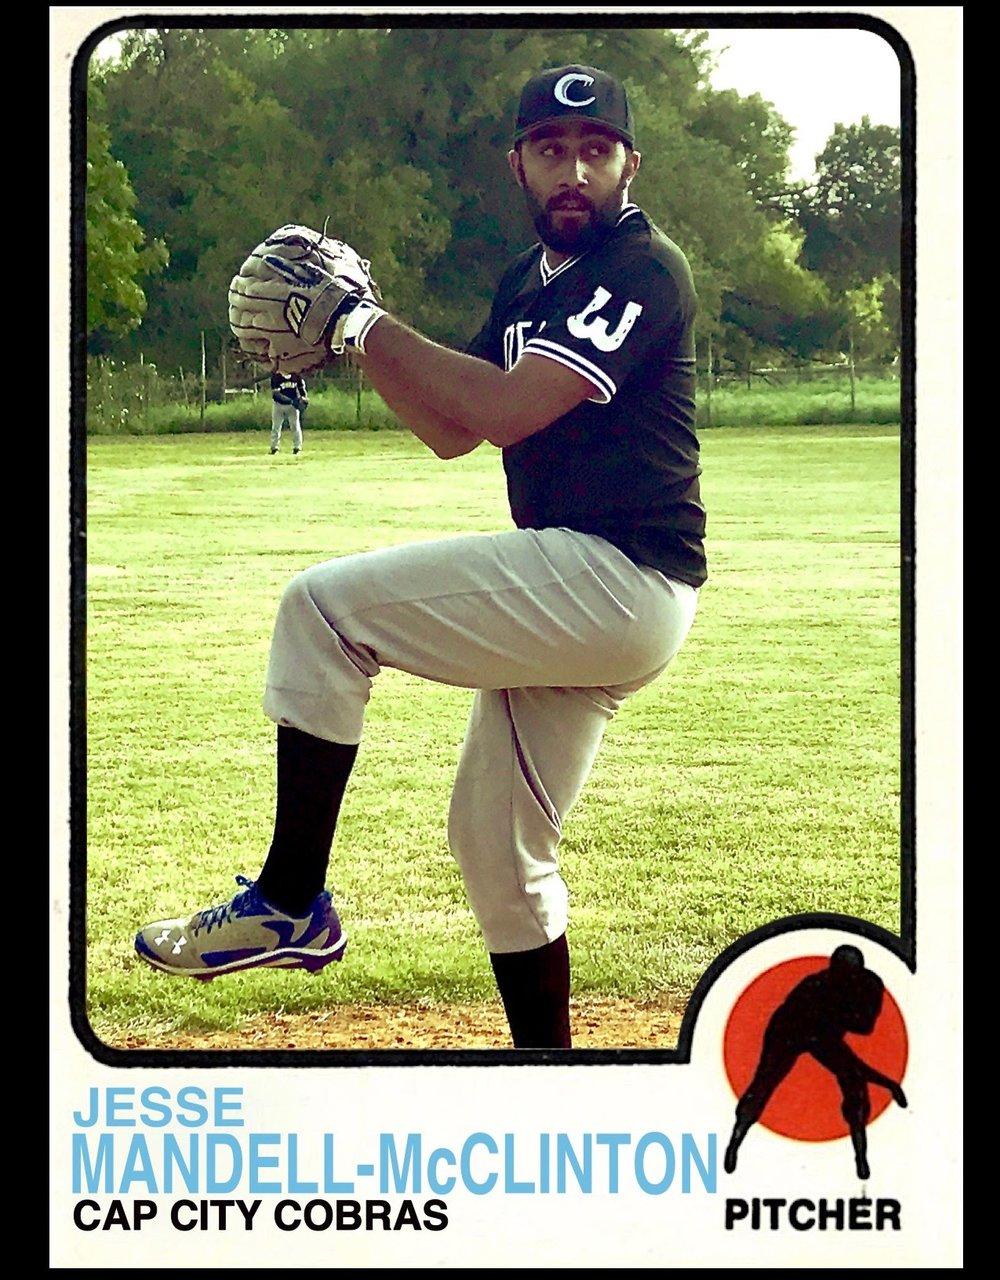 #13 - Jesse Mandell-McClinton